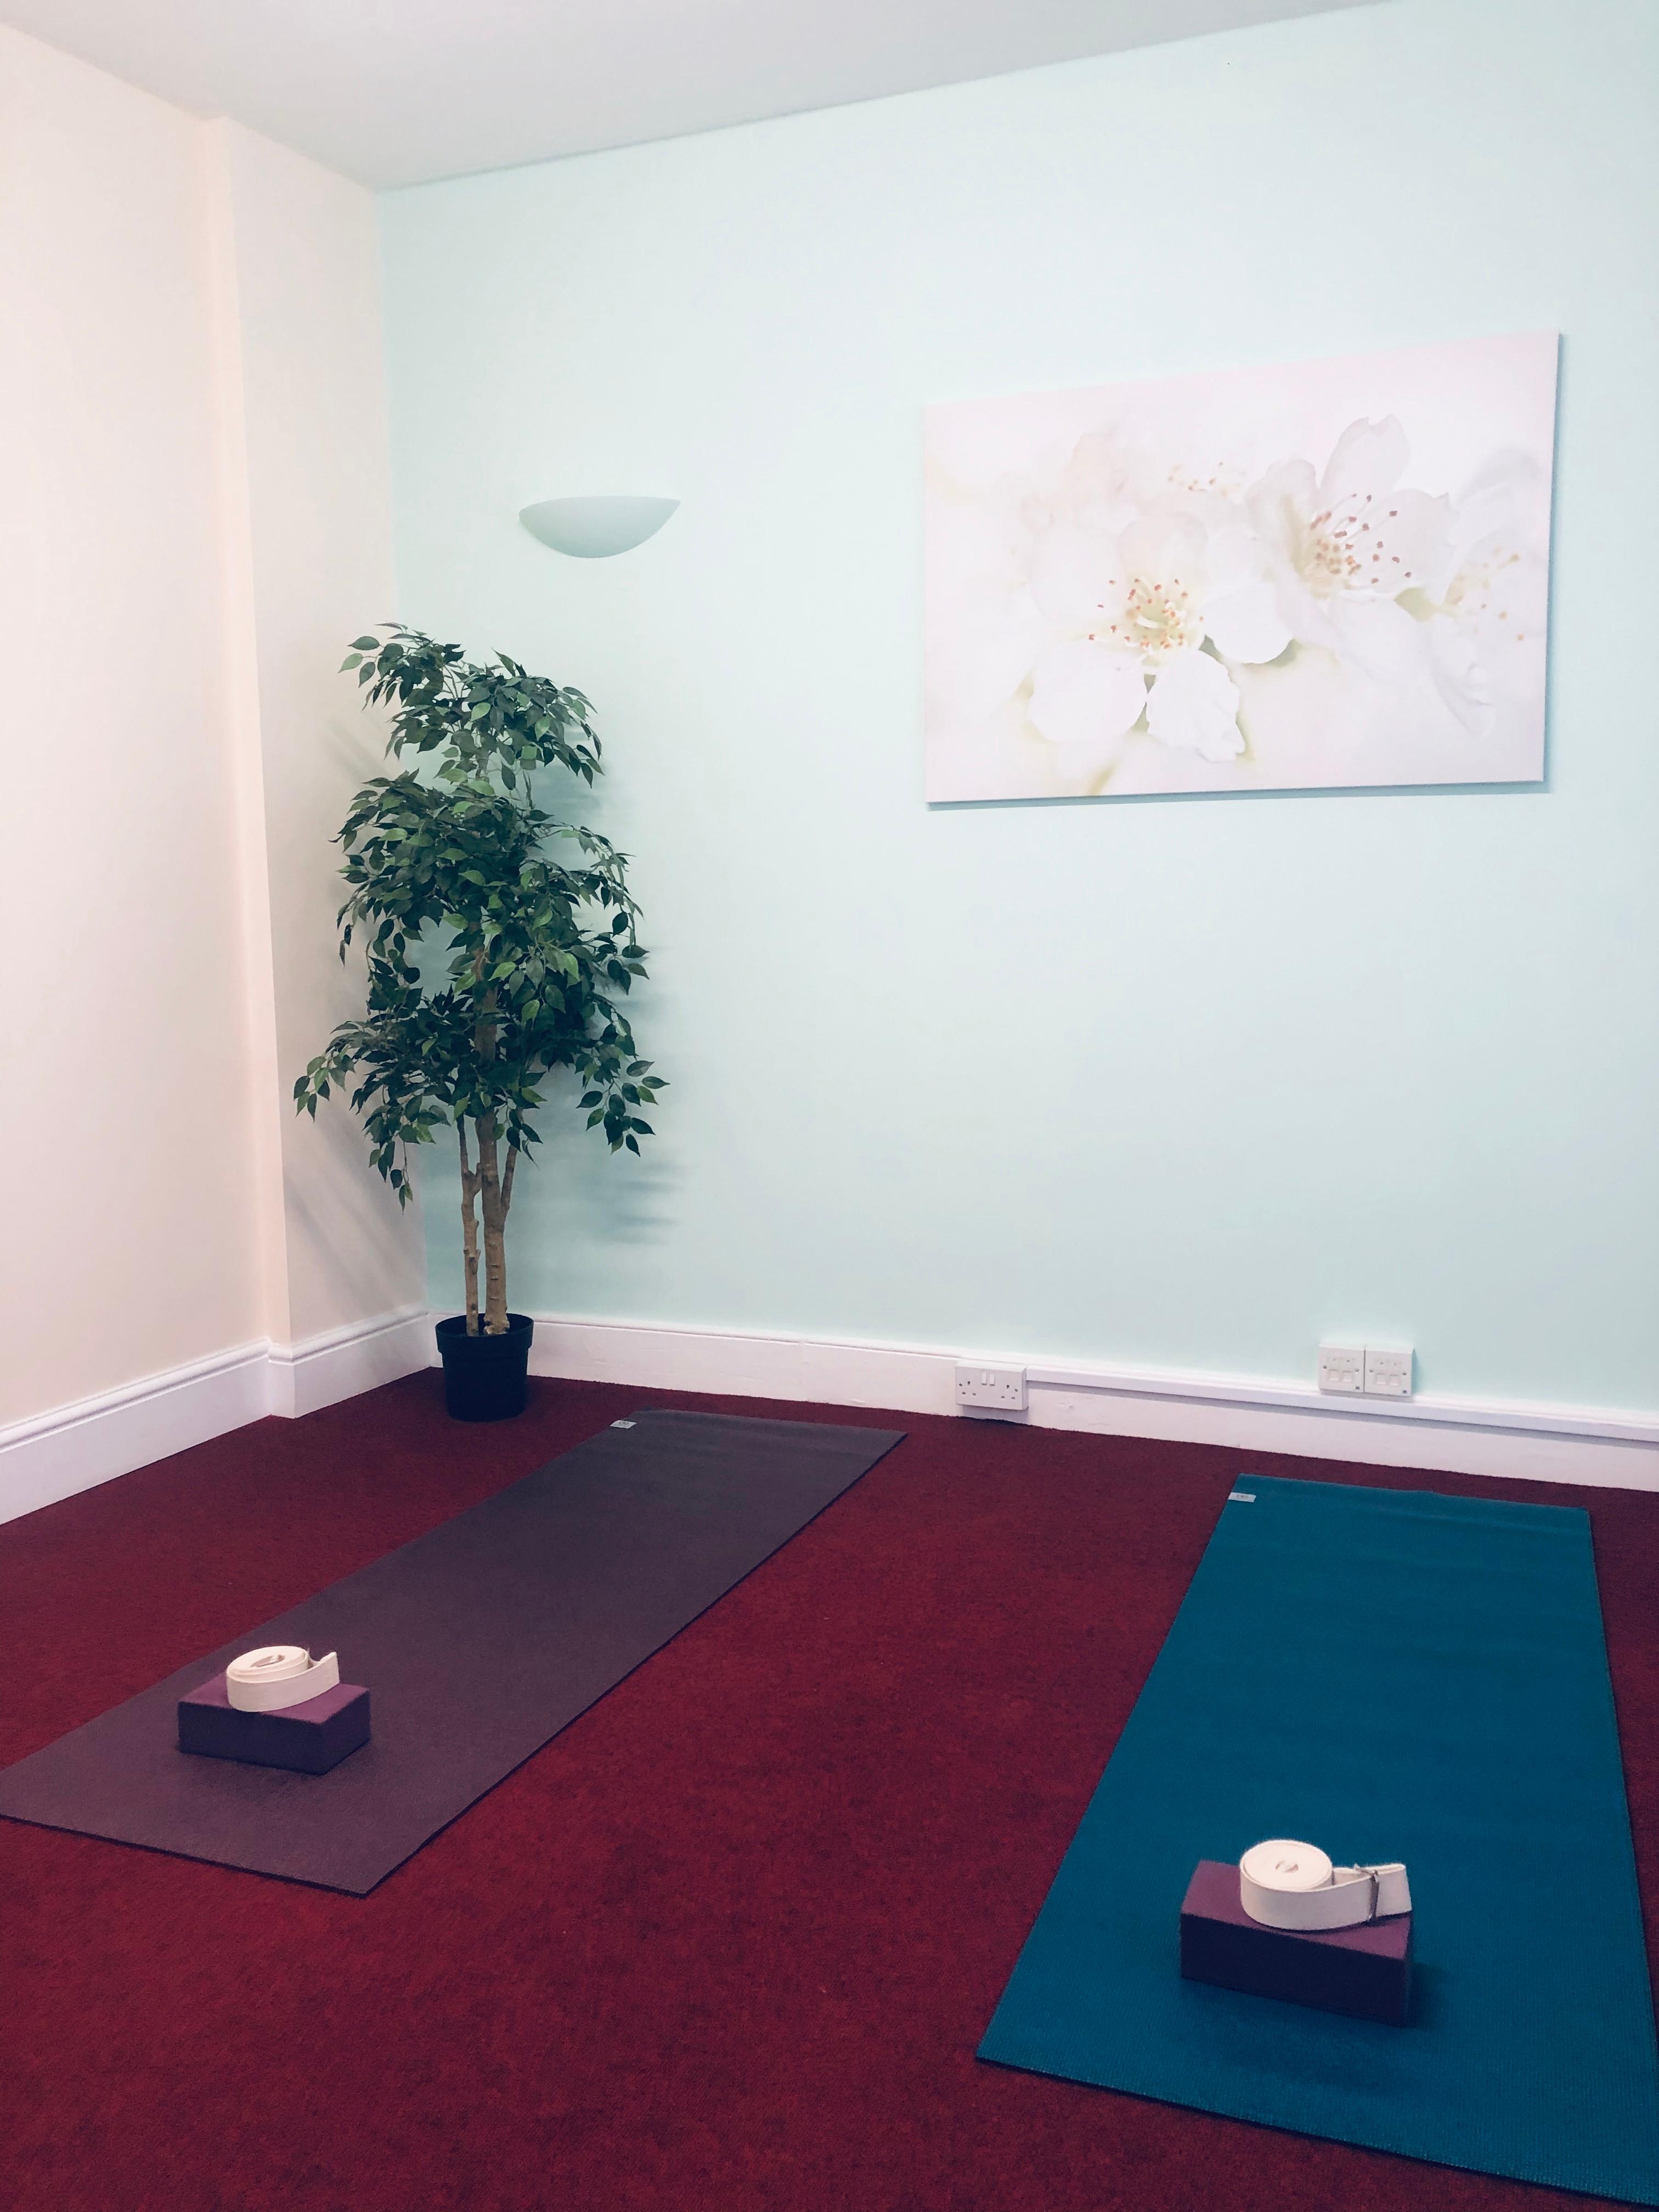 Private 1:1 or 2:1 Yoga Sessions (WTC)